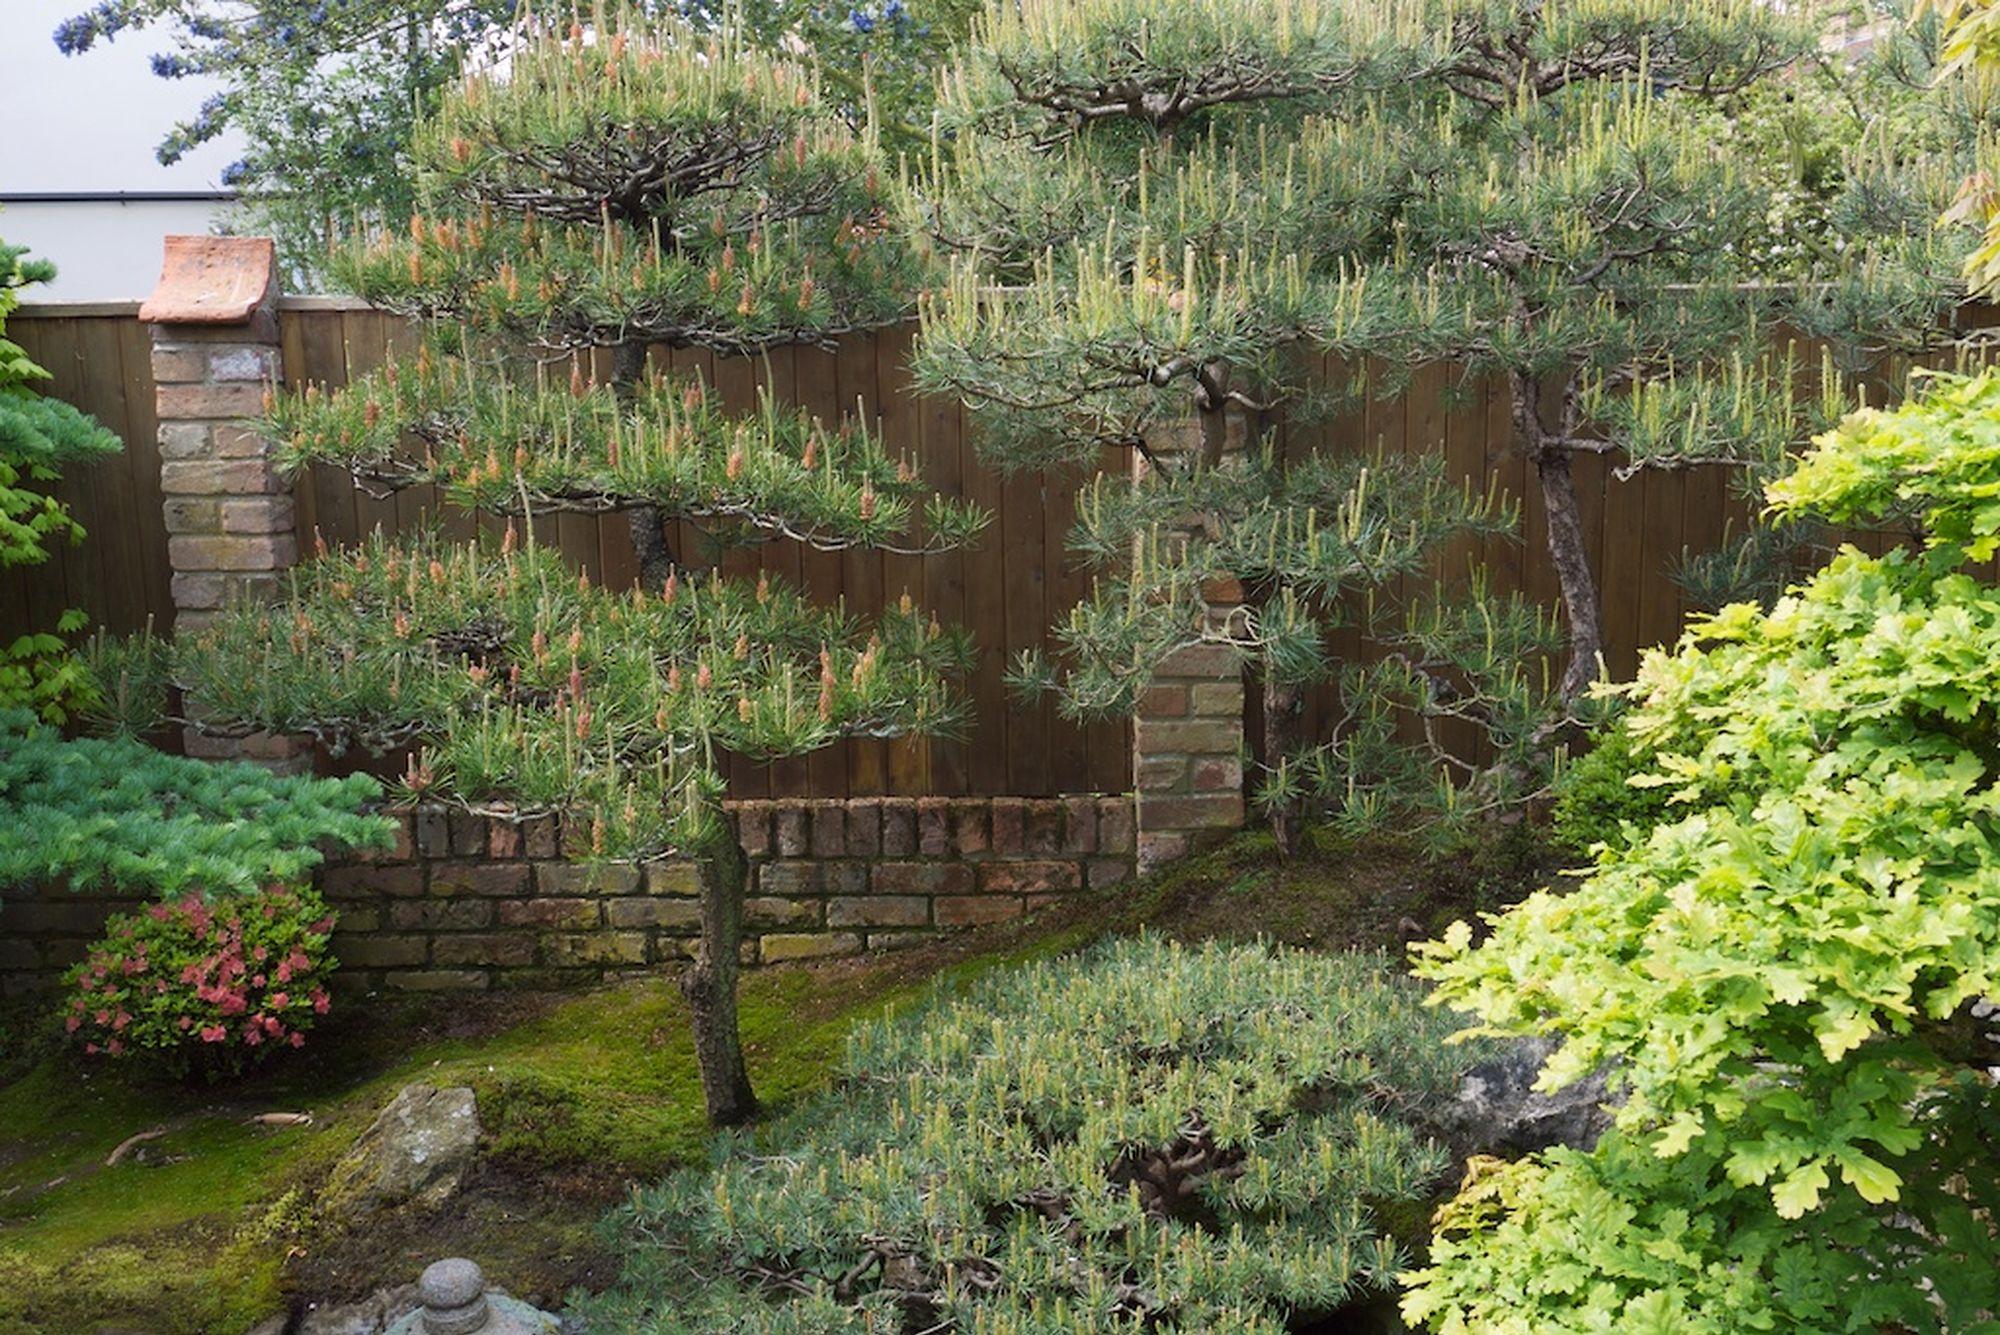 Sievert scots pines